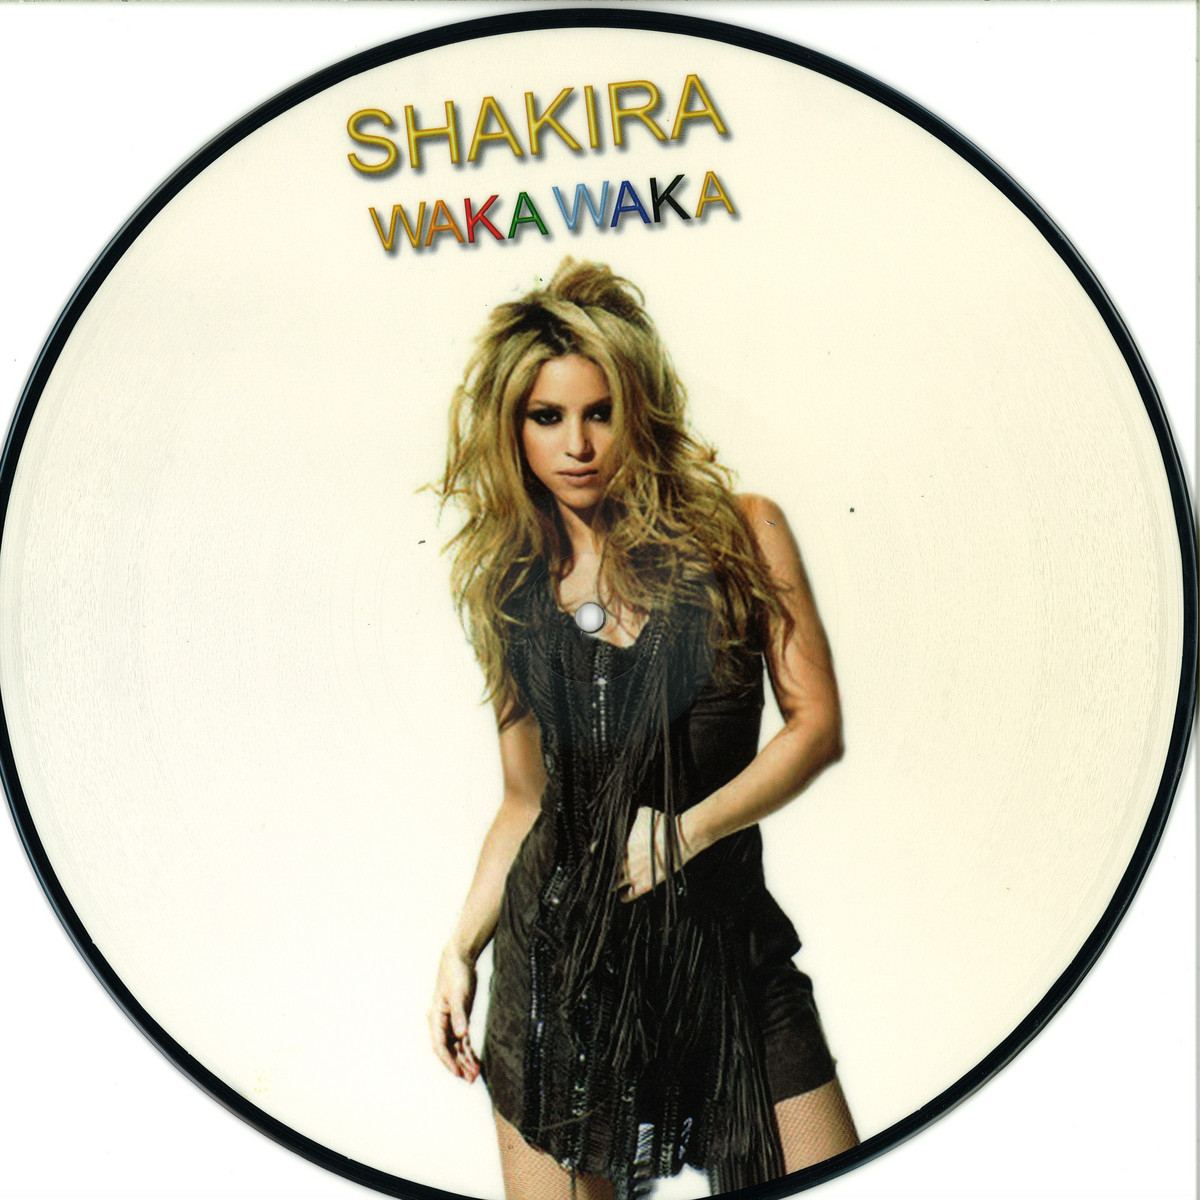 Шакира вака вака минусовка 8 фотография